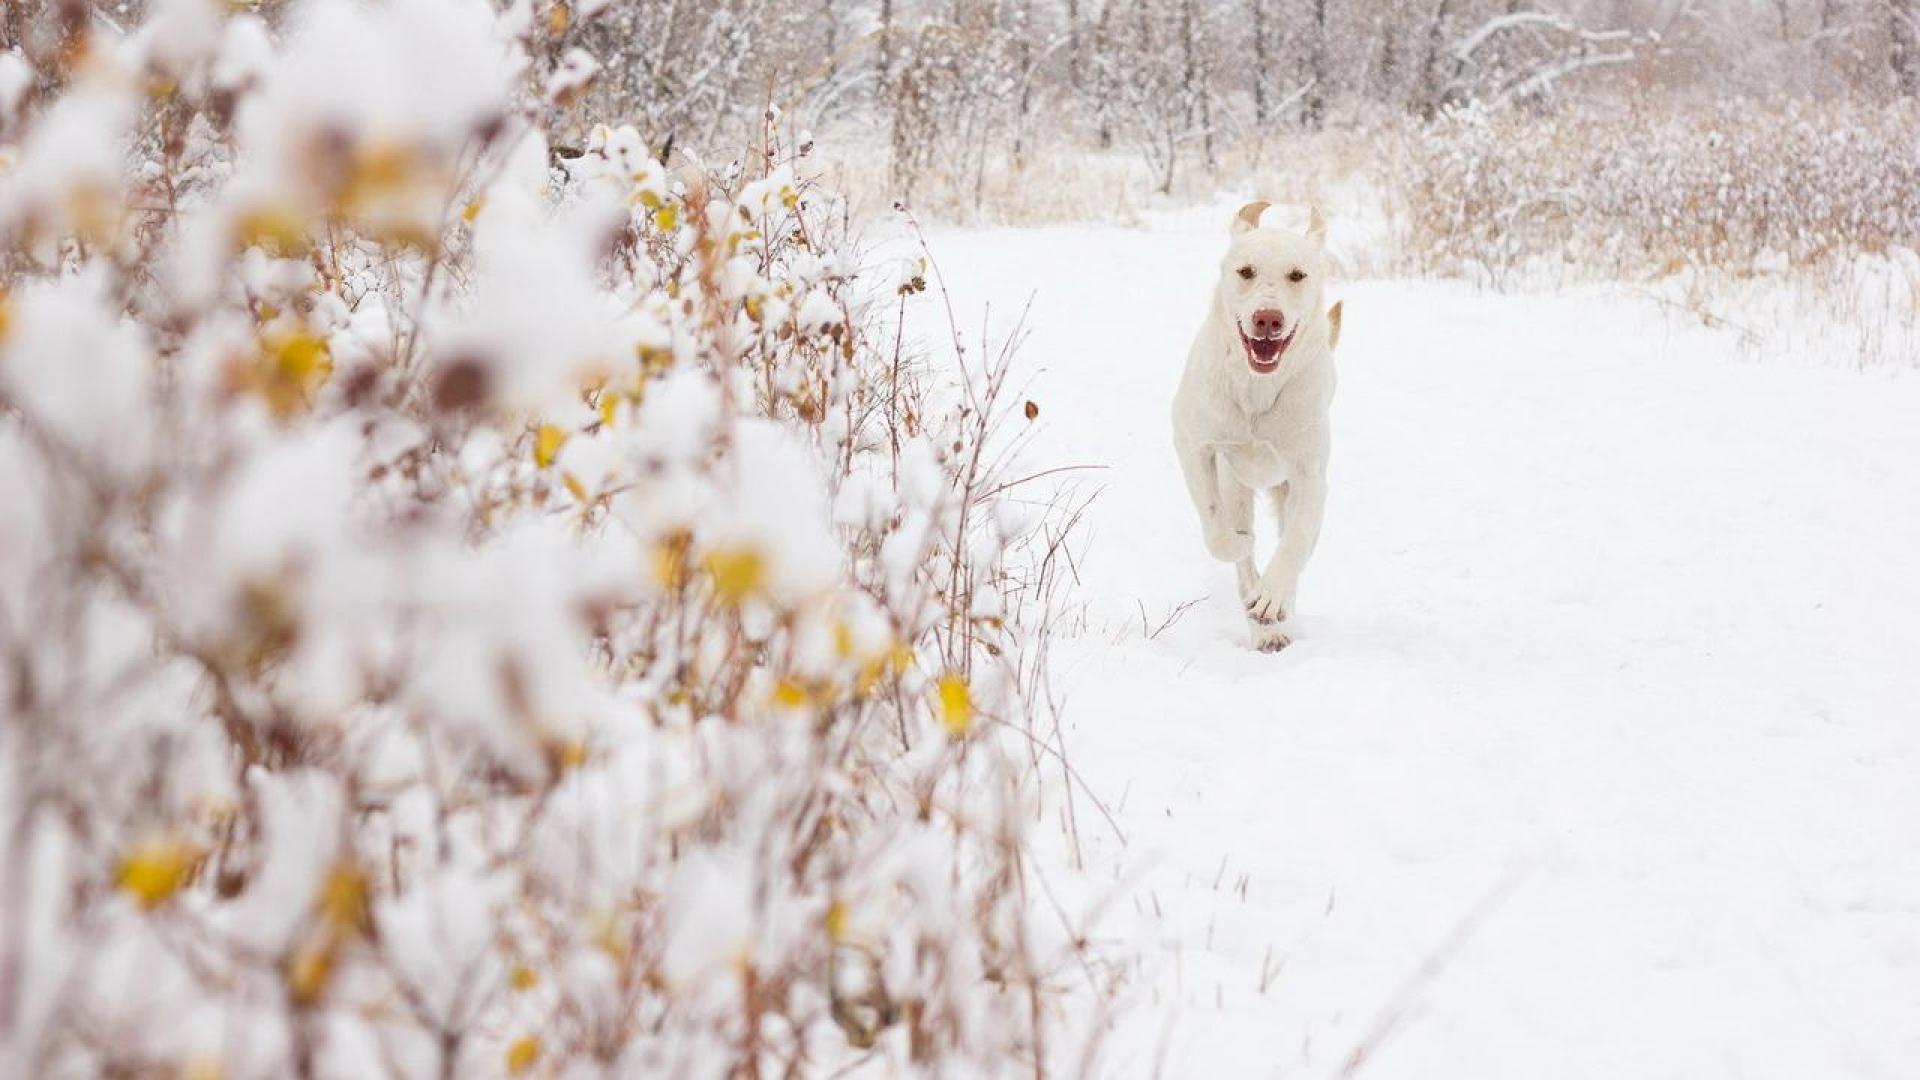 winter dog wallpaper - (#82340) - HQ Desktop Wallpapers - [HD4desktop ...